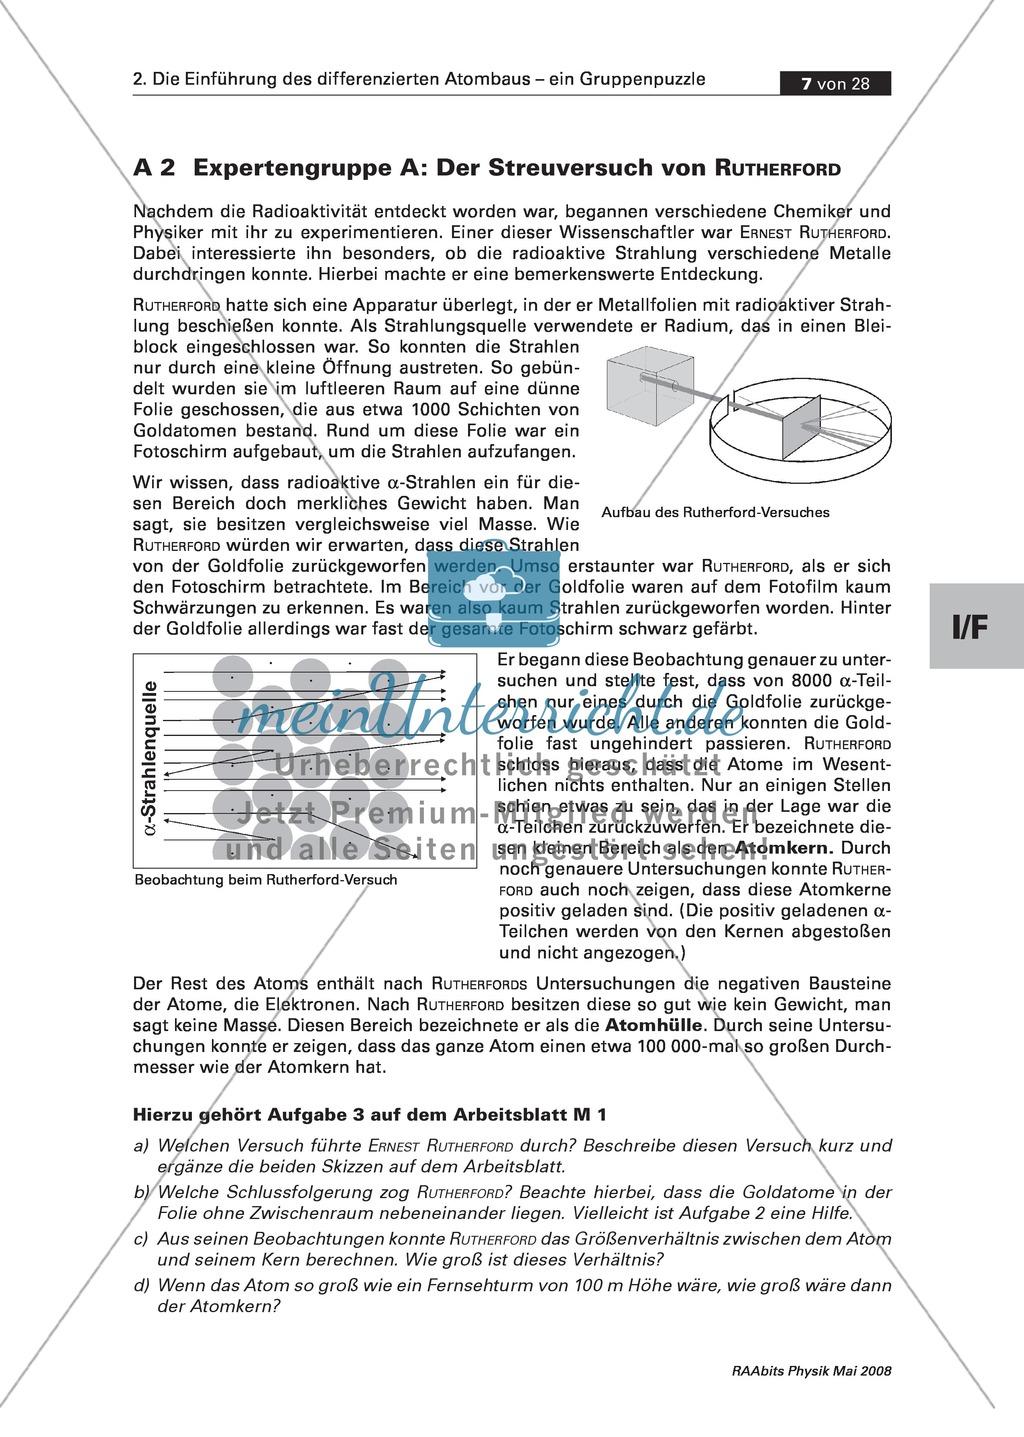 Famous Modelle Des Atoms Arbeitsblatt Elaboration - Kindergarten ...